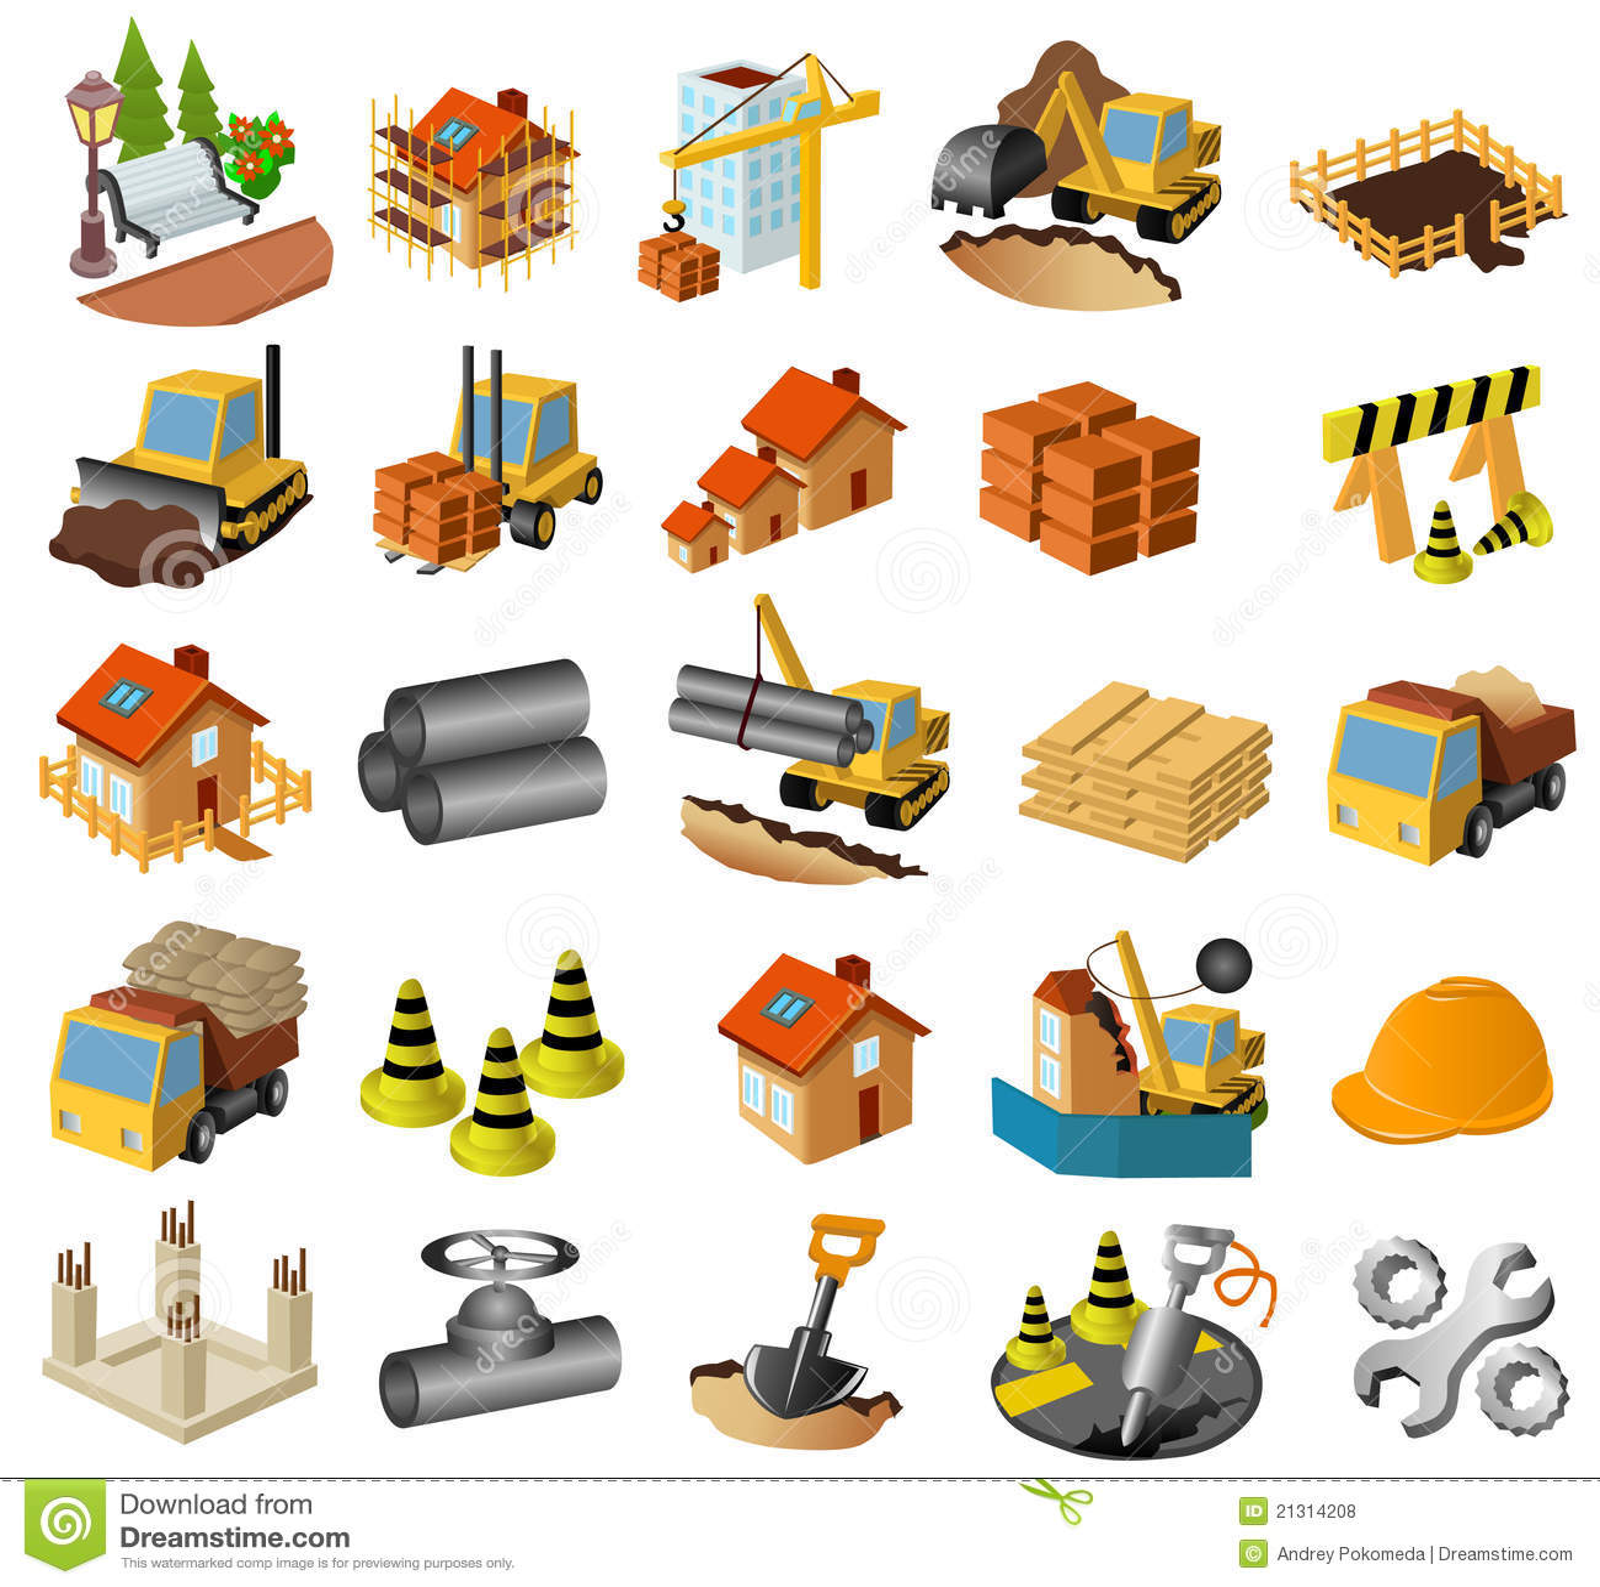 Building Construction Clip Art : Building and construction set royalty free stock photos